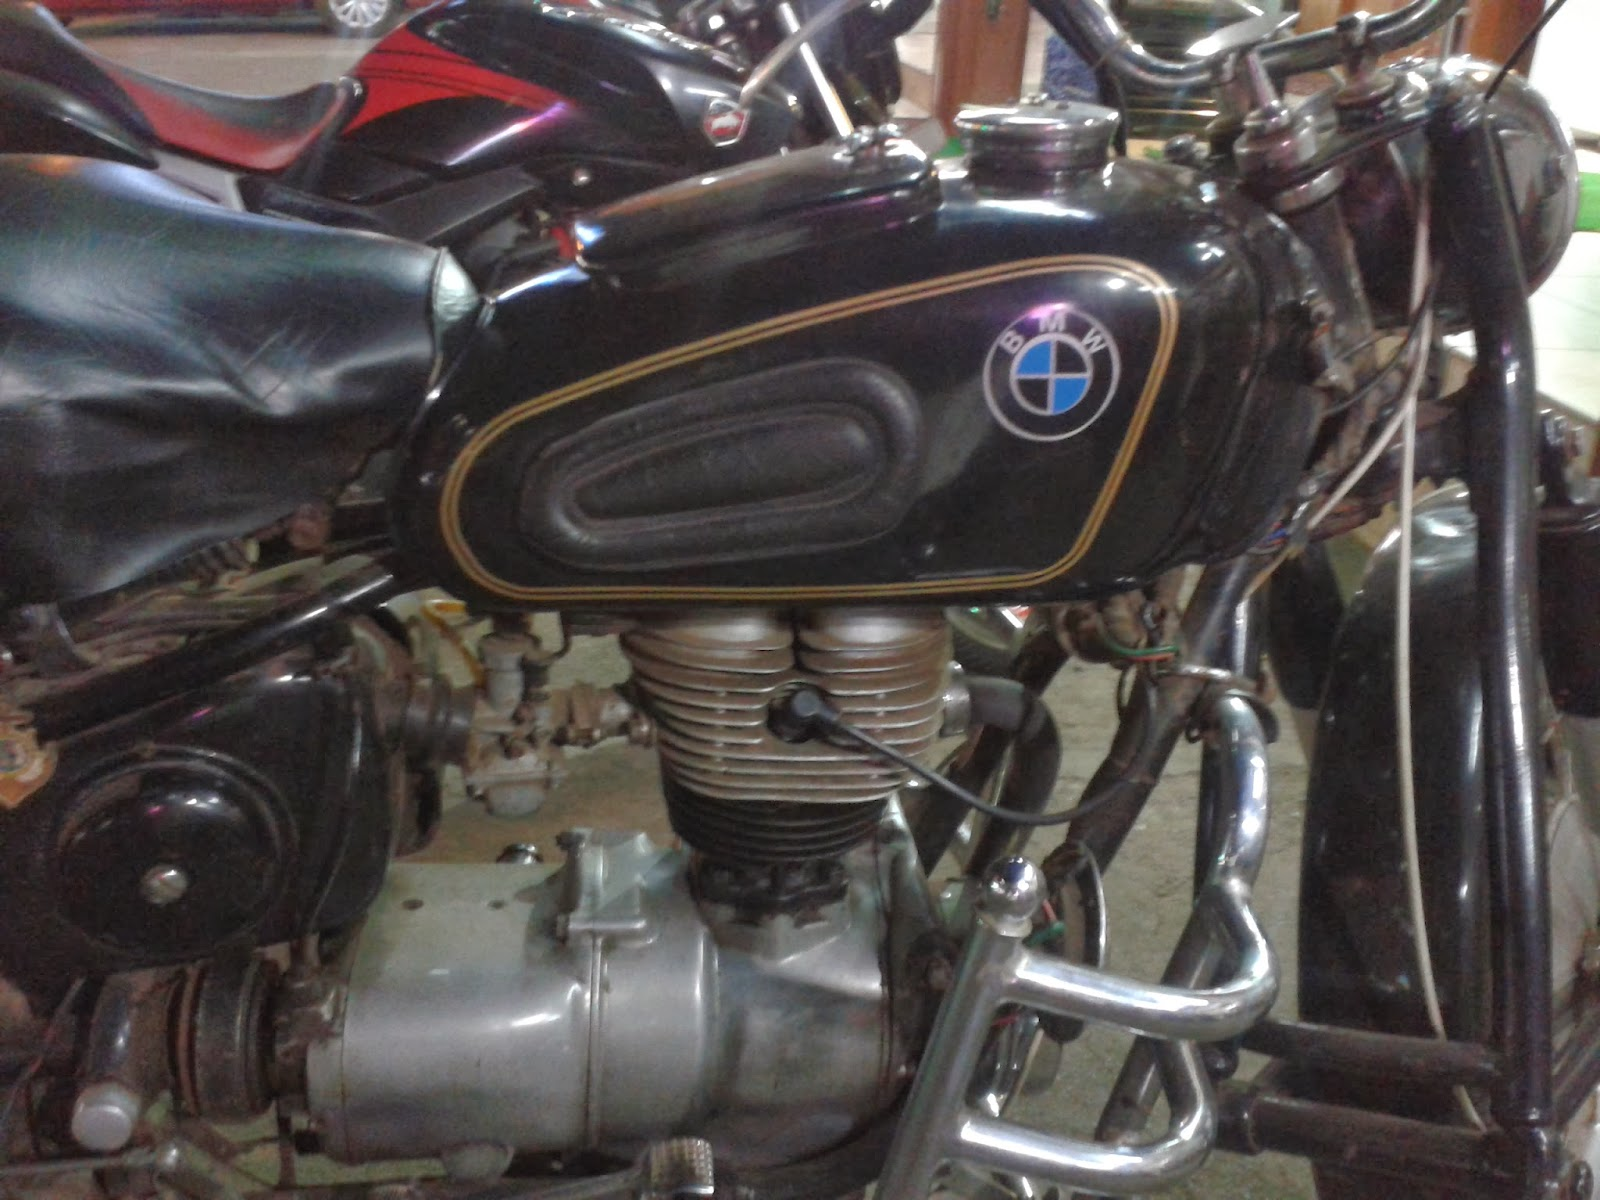 bmw classic motorcycle in India|bmw vintage motorcycles in India|bmw classic motorcycle in Kerala|bmw vintage motorcycle in Kerala| BMW vintage motorcycles in Thrissur| BMW classic motorbike in Thrissur| BMW R 27